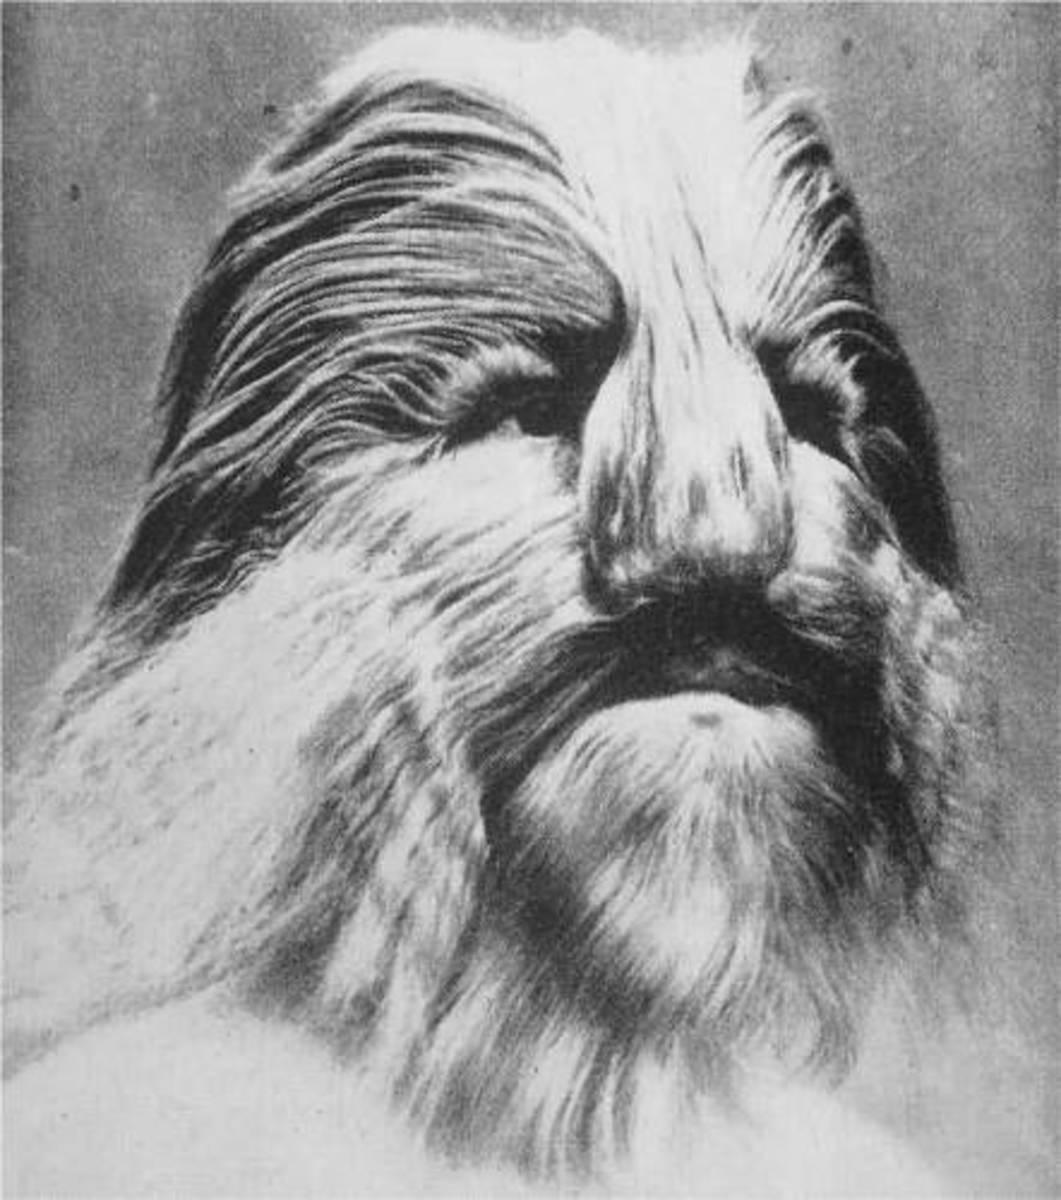 LIONEL THE LION FACED BOY